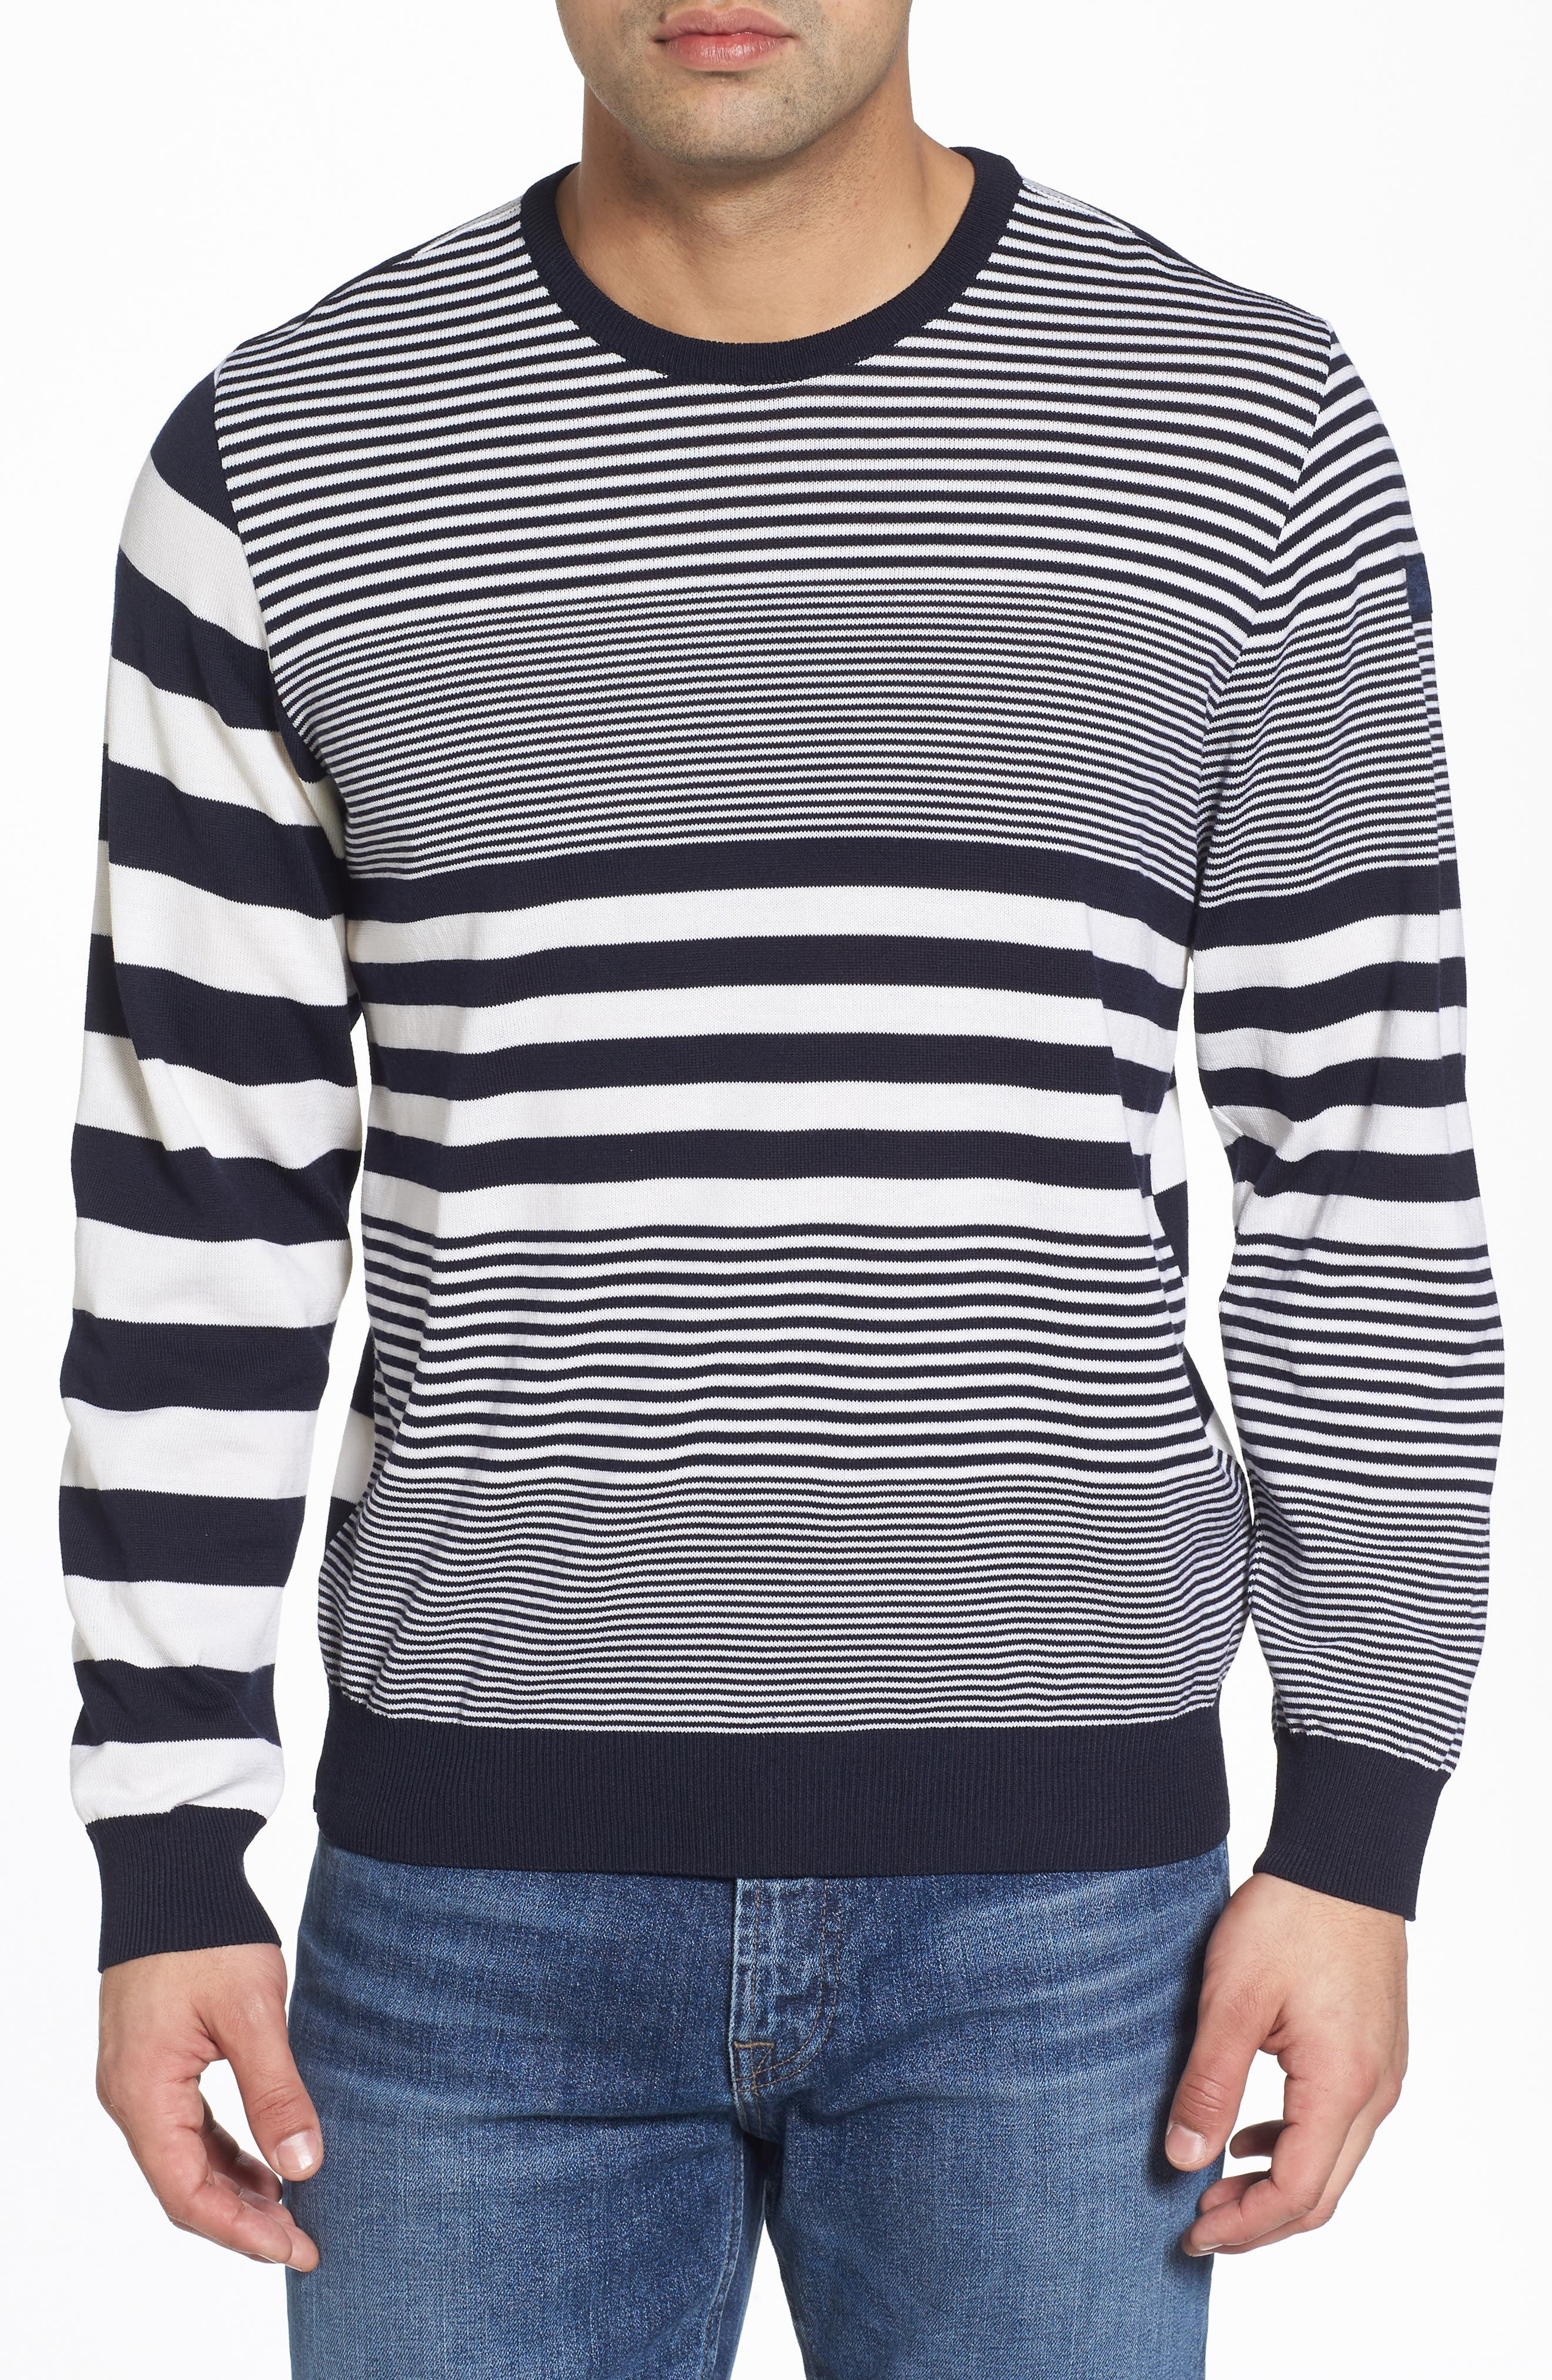 Paul&Shark Stripe Wool Sweater,                         Main,                         color, Navy/ White